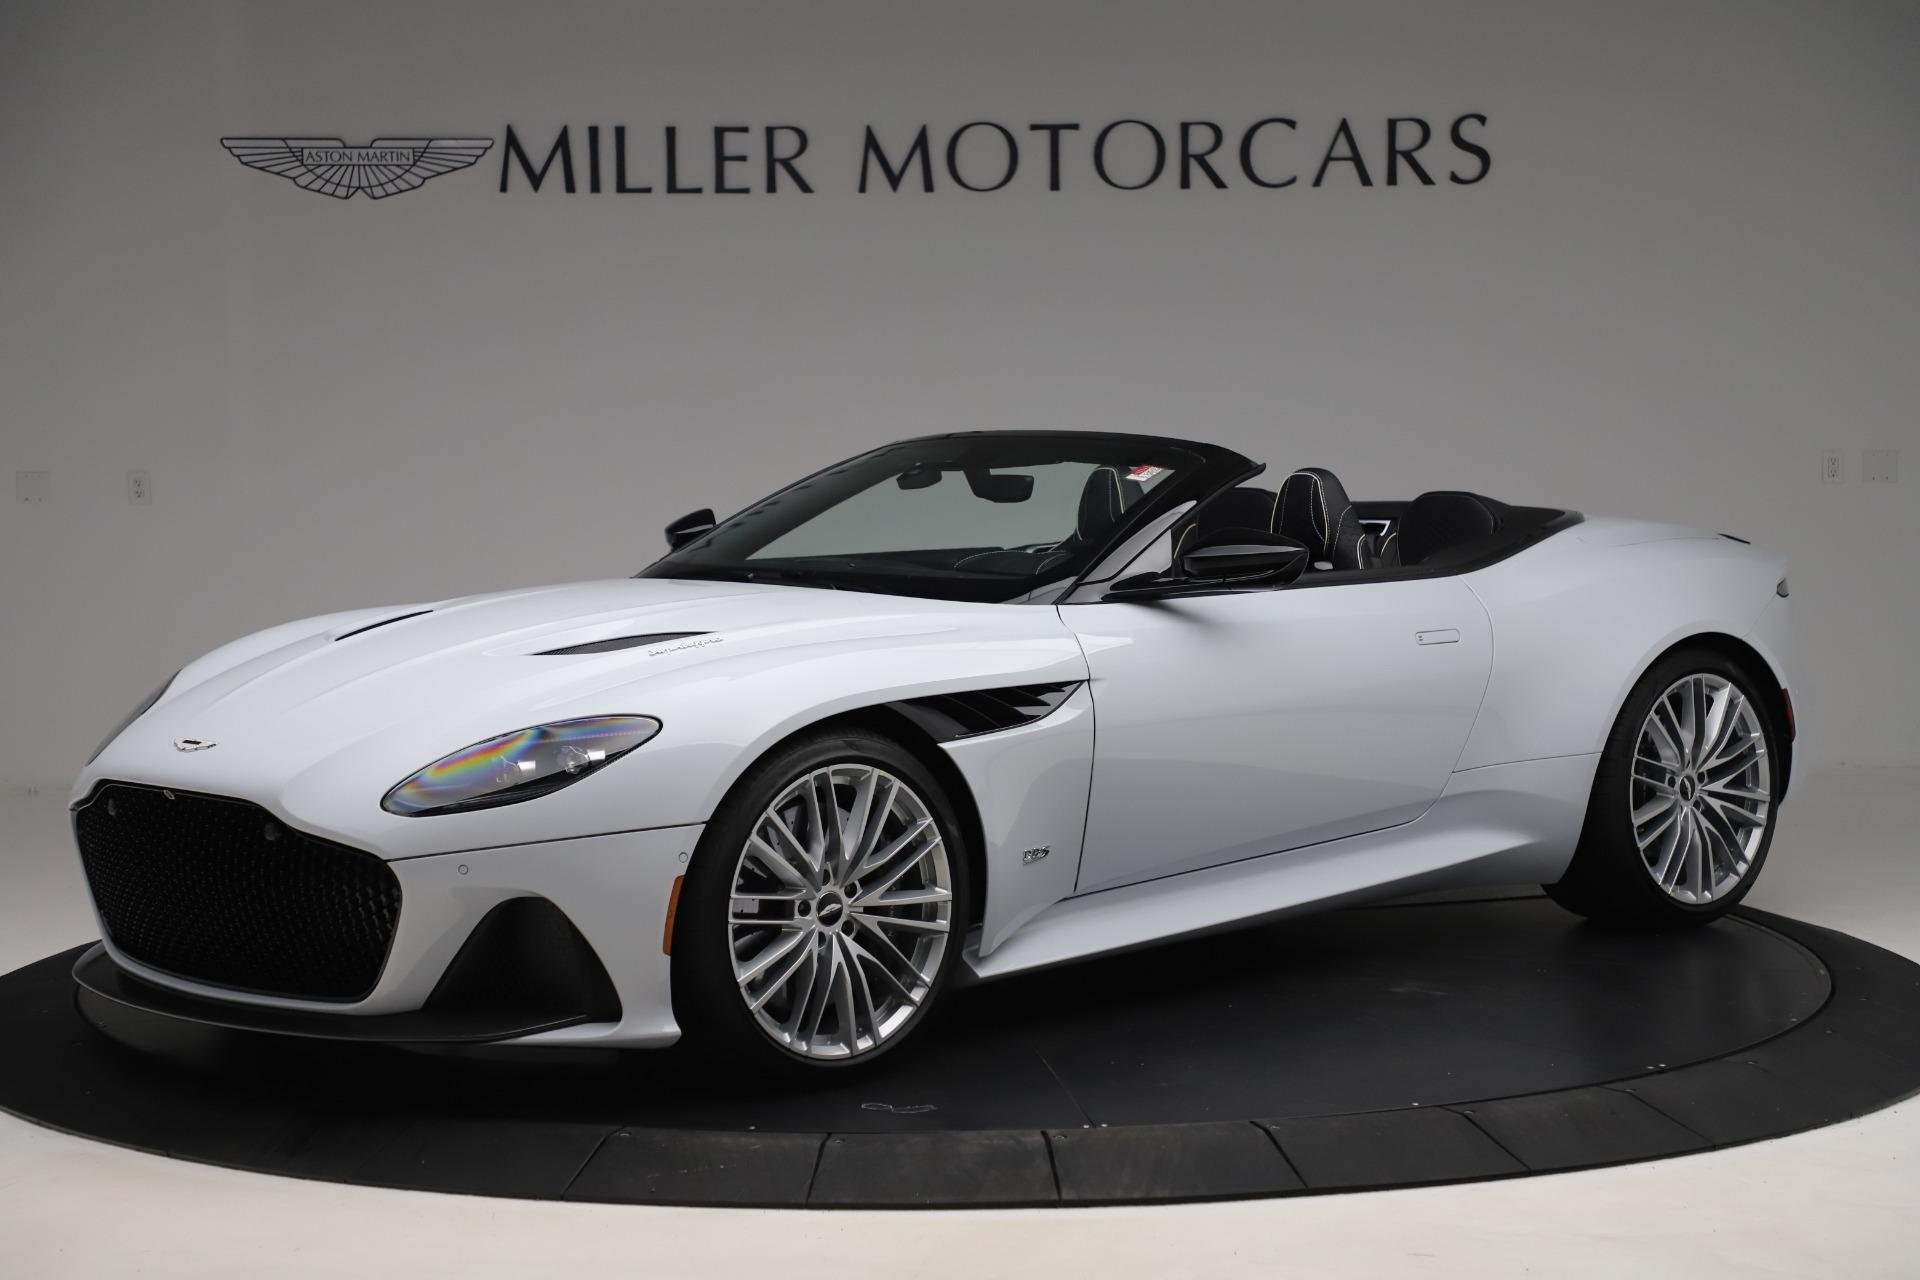 New 2020 Aston Martin DBS Superleggera Volante Convertible for sale $353,931 at Pagani of Greenwich in Greenwich CT 06830 1